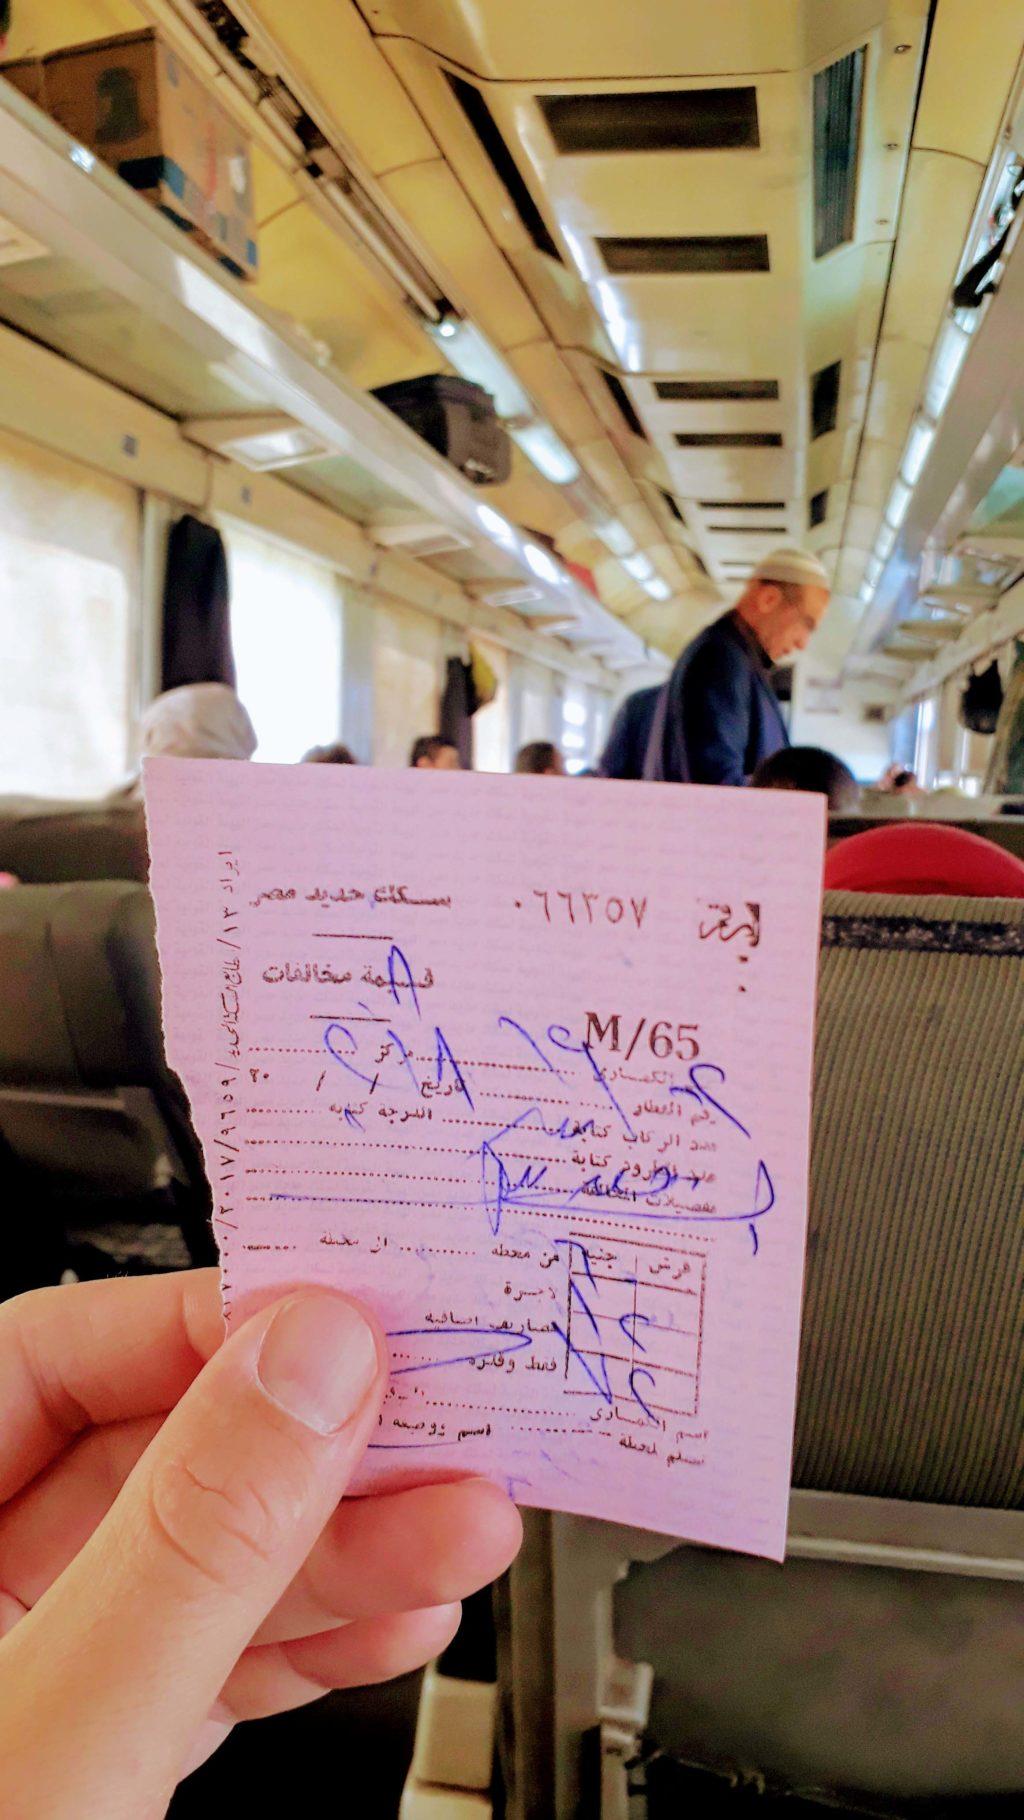 Ticket im Zug nach Assuan